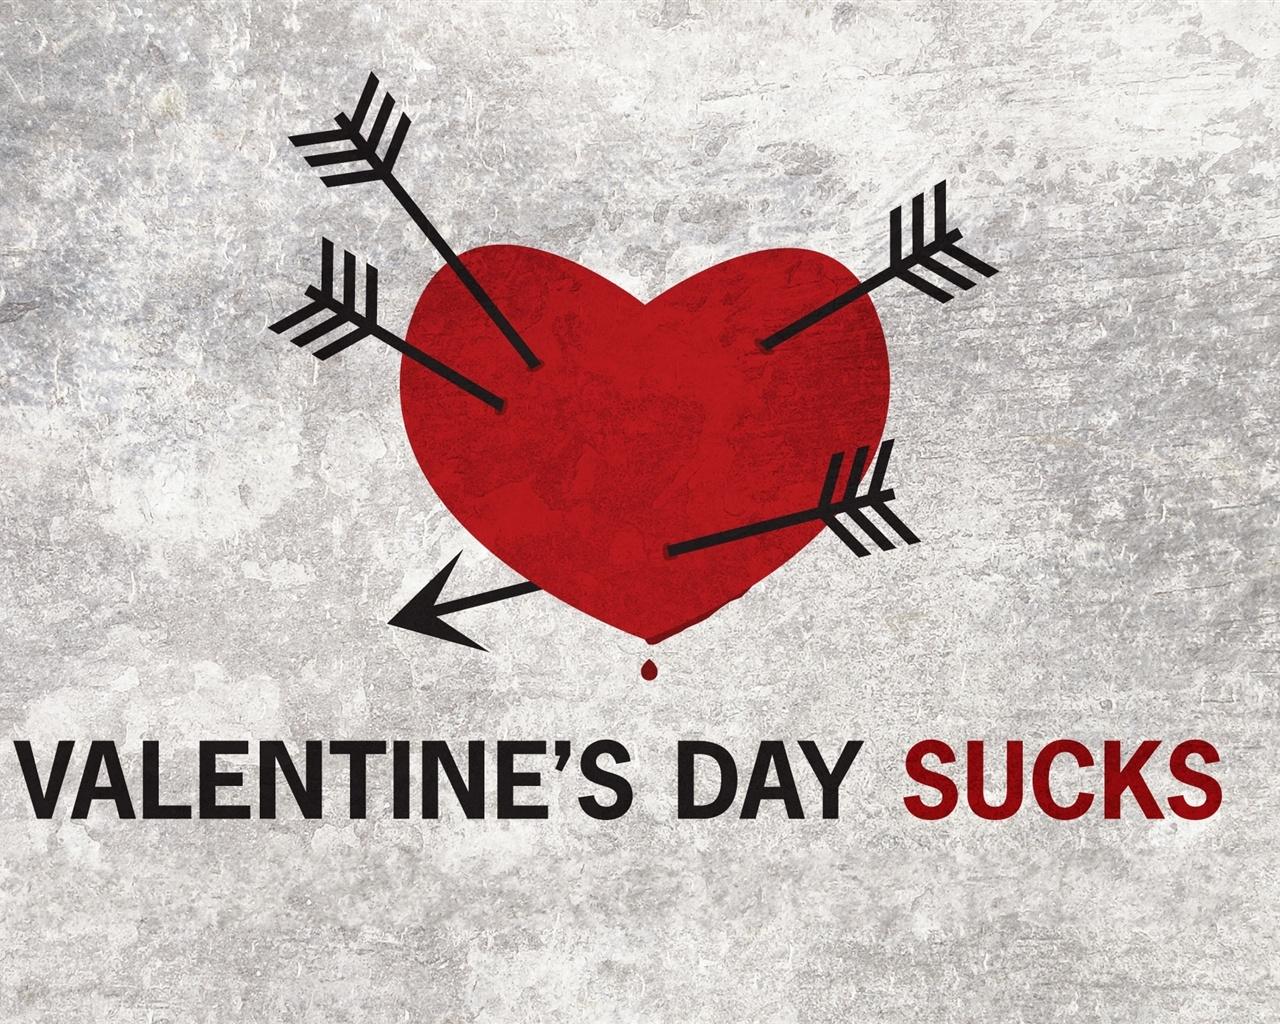 Day picture suck valentine